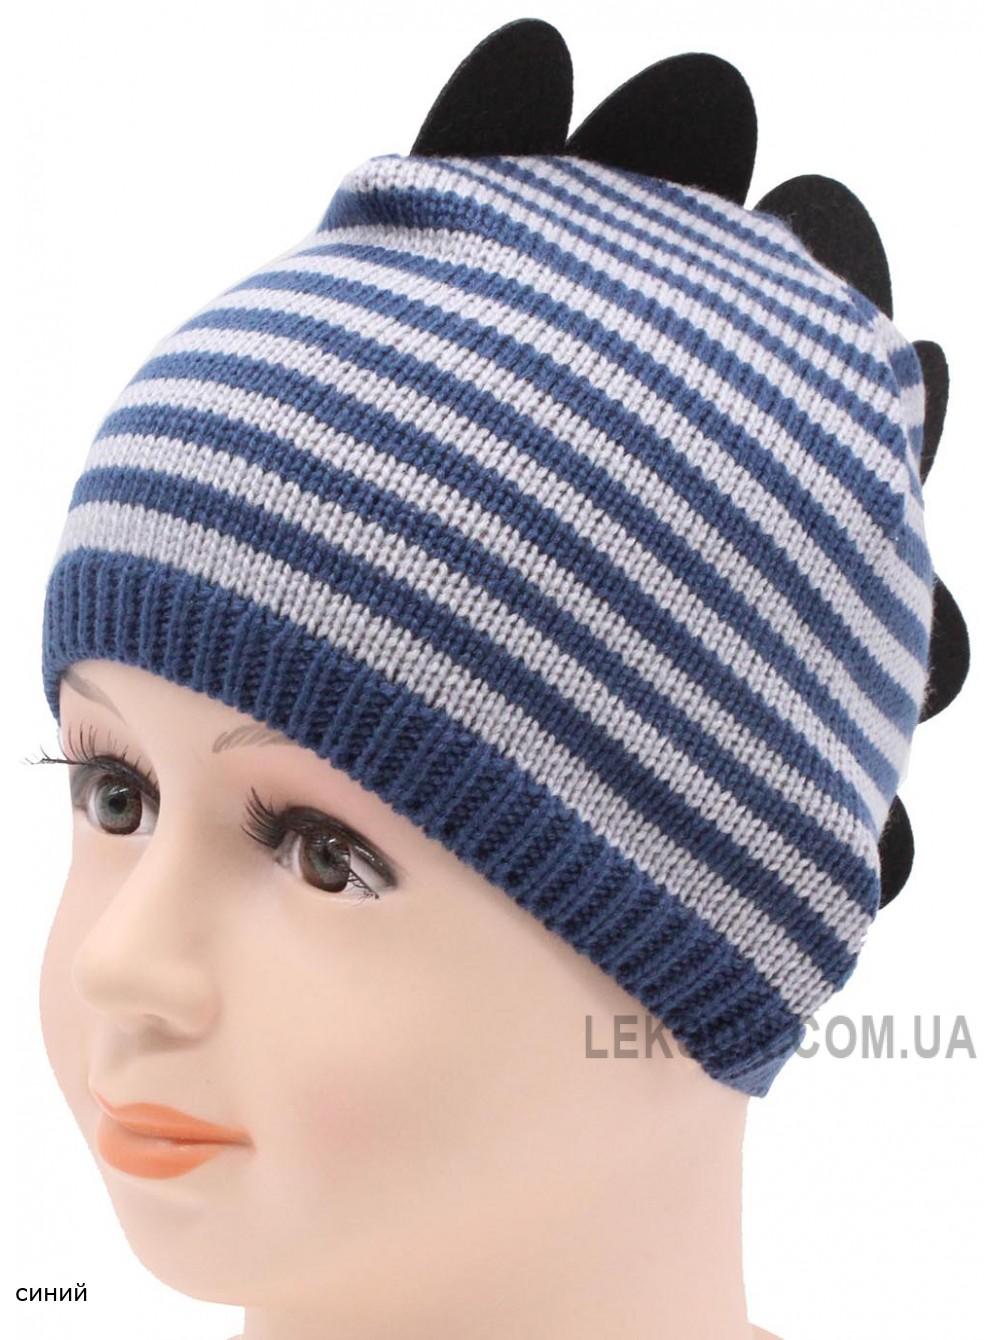 Детская вязаная шапка Дракоша DV119-29-44-48